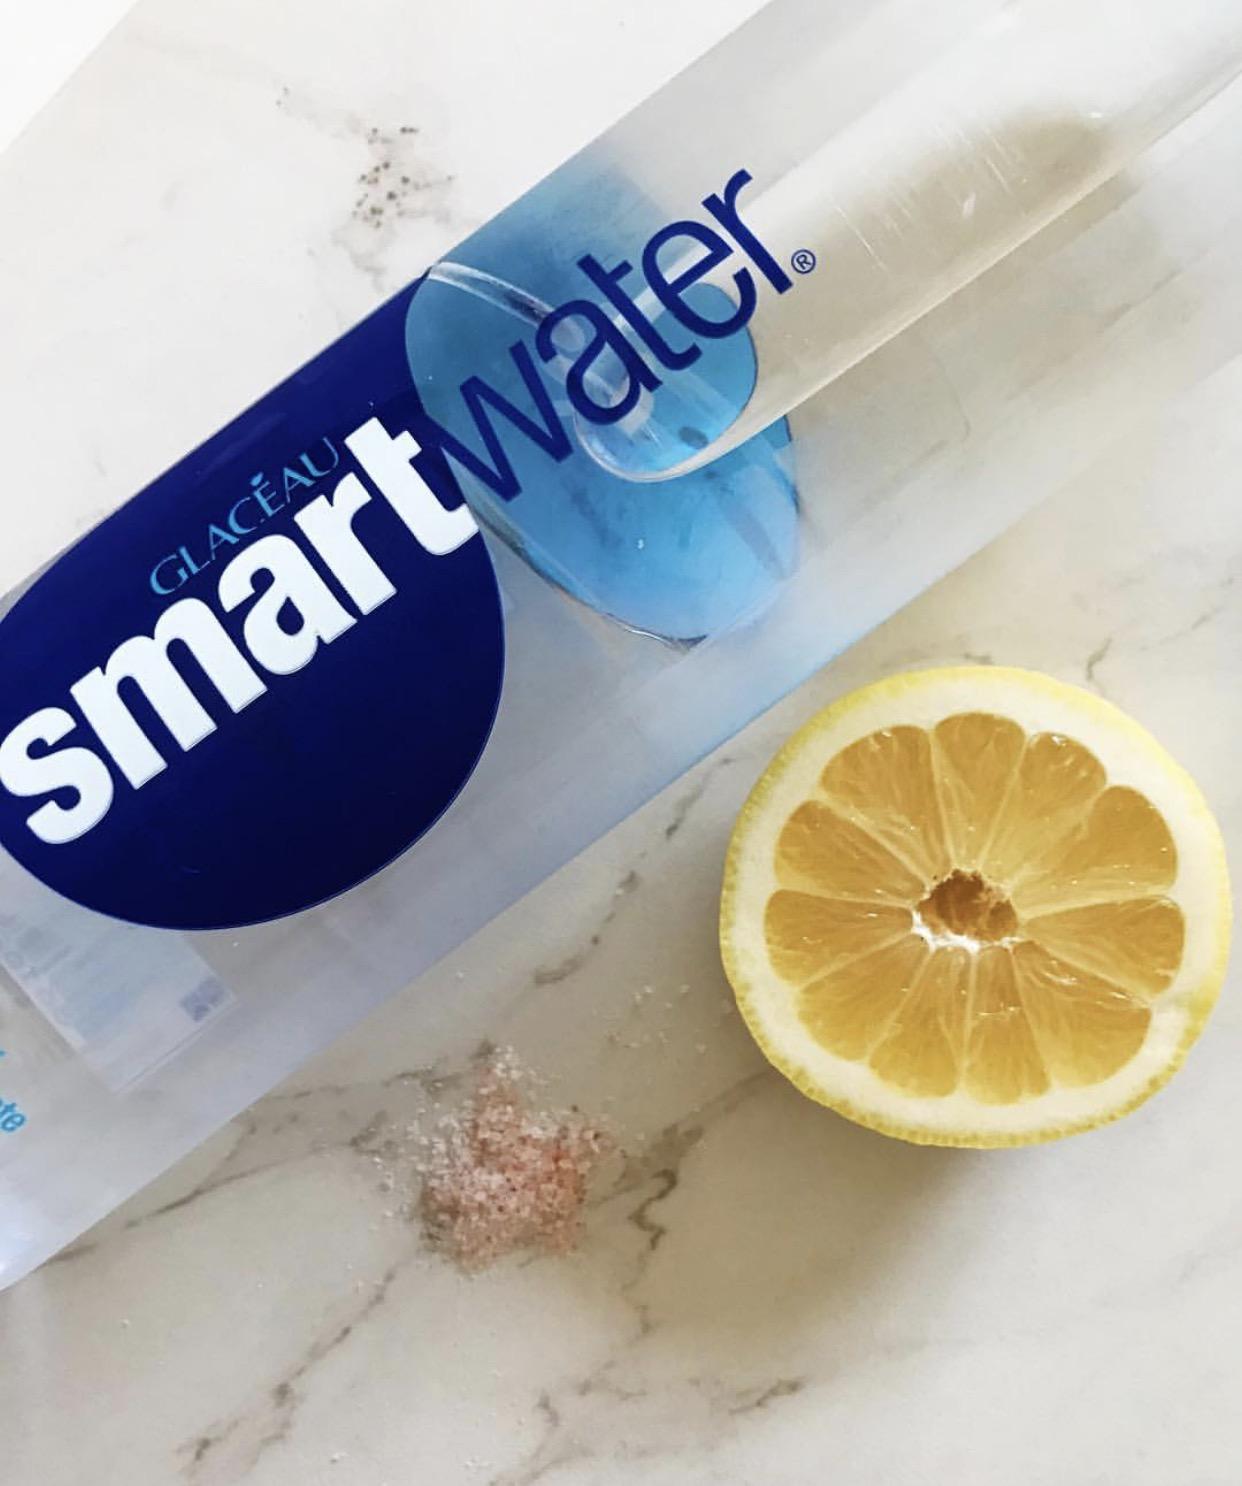 smartwate.jpg